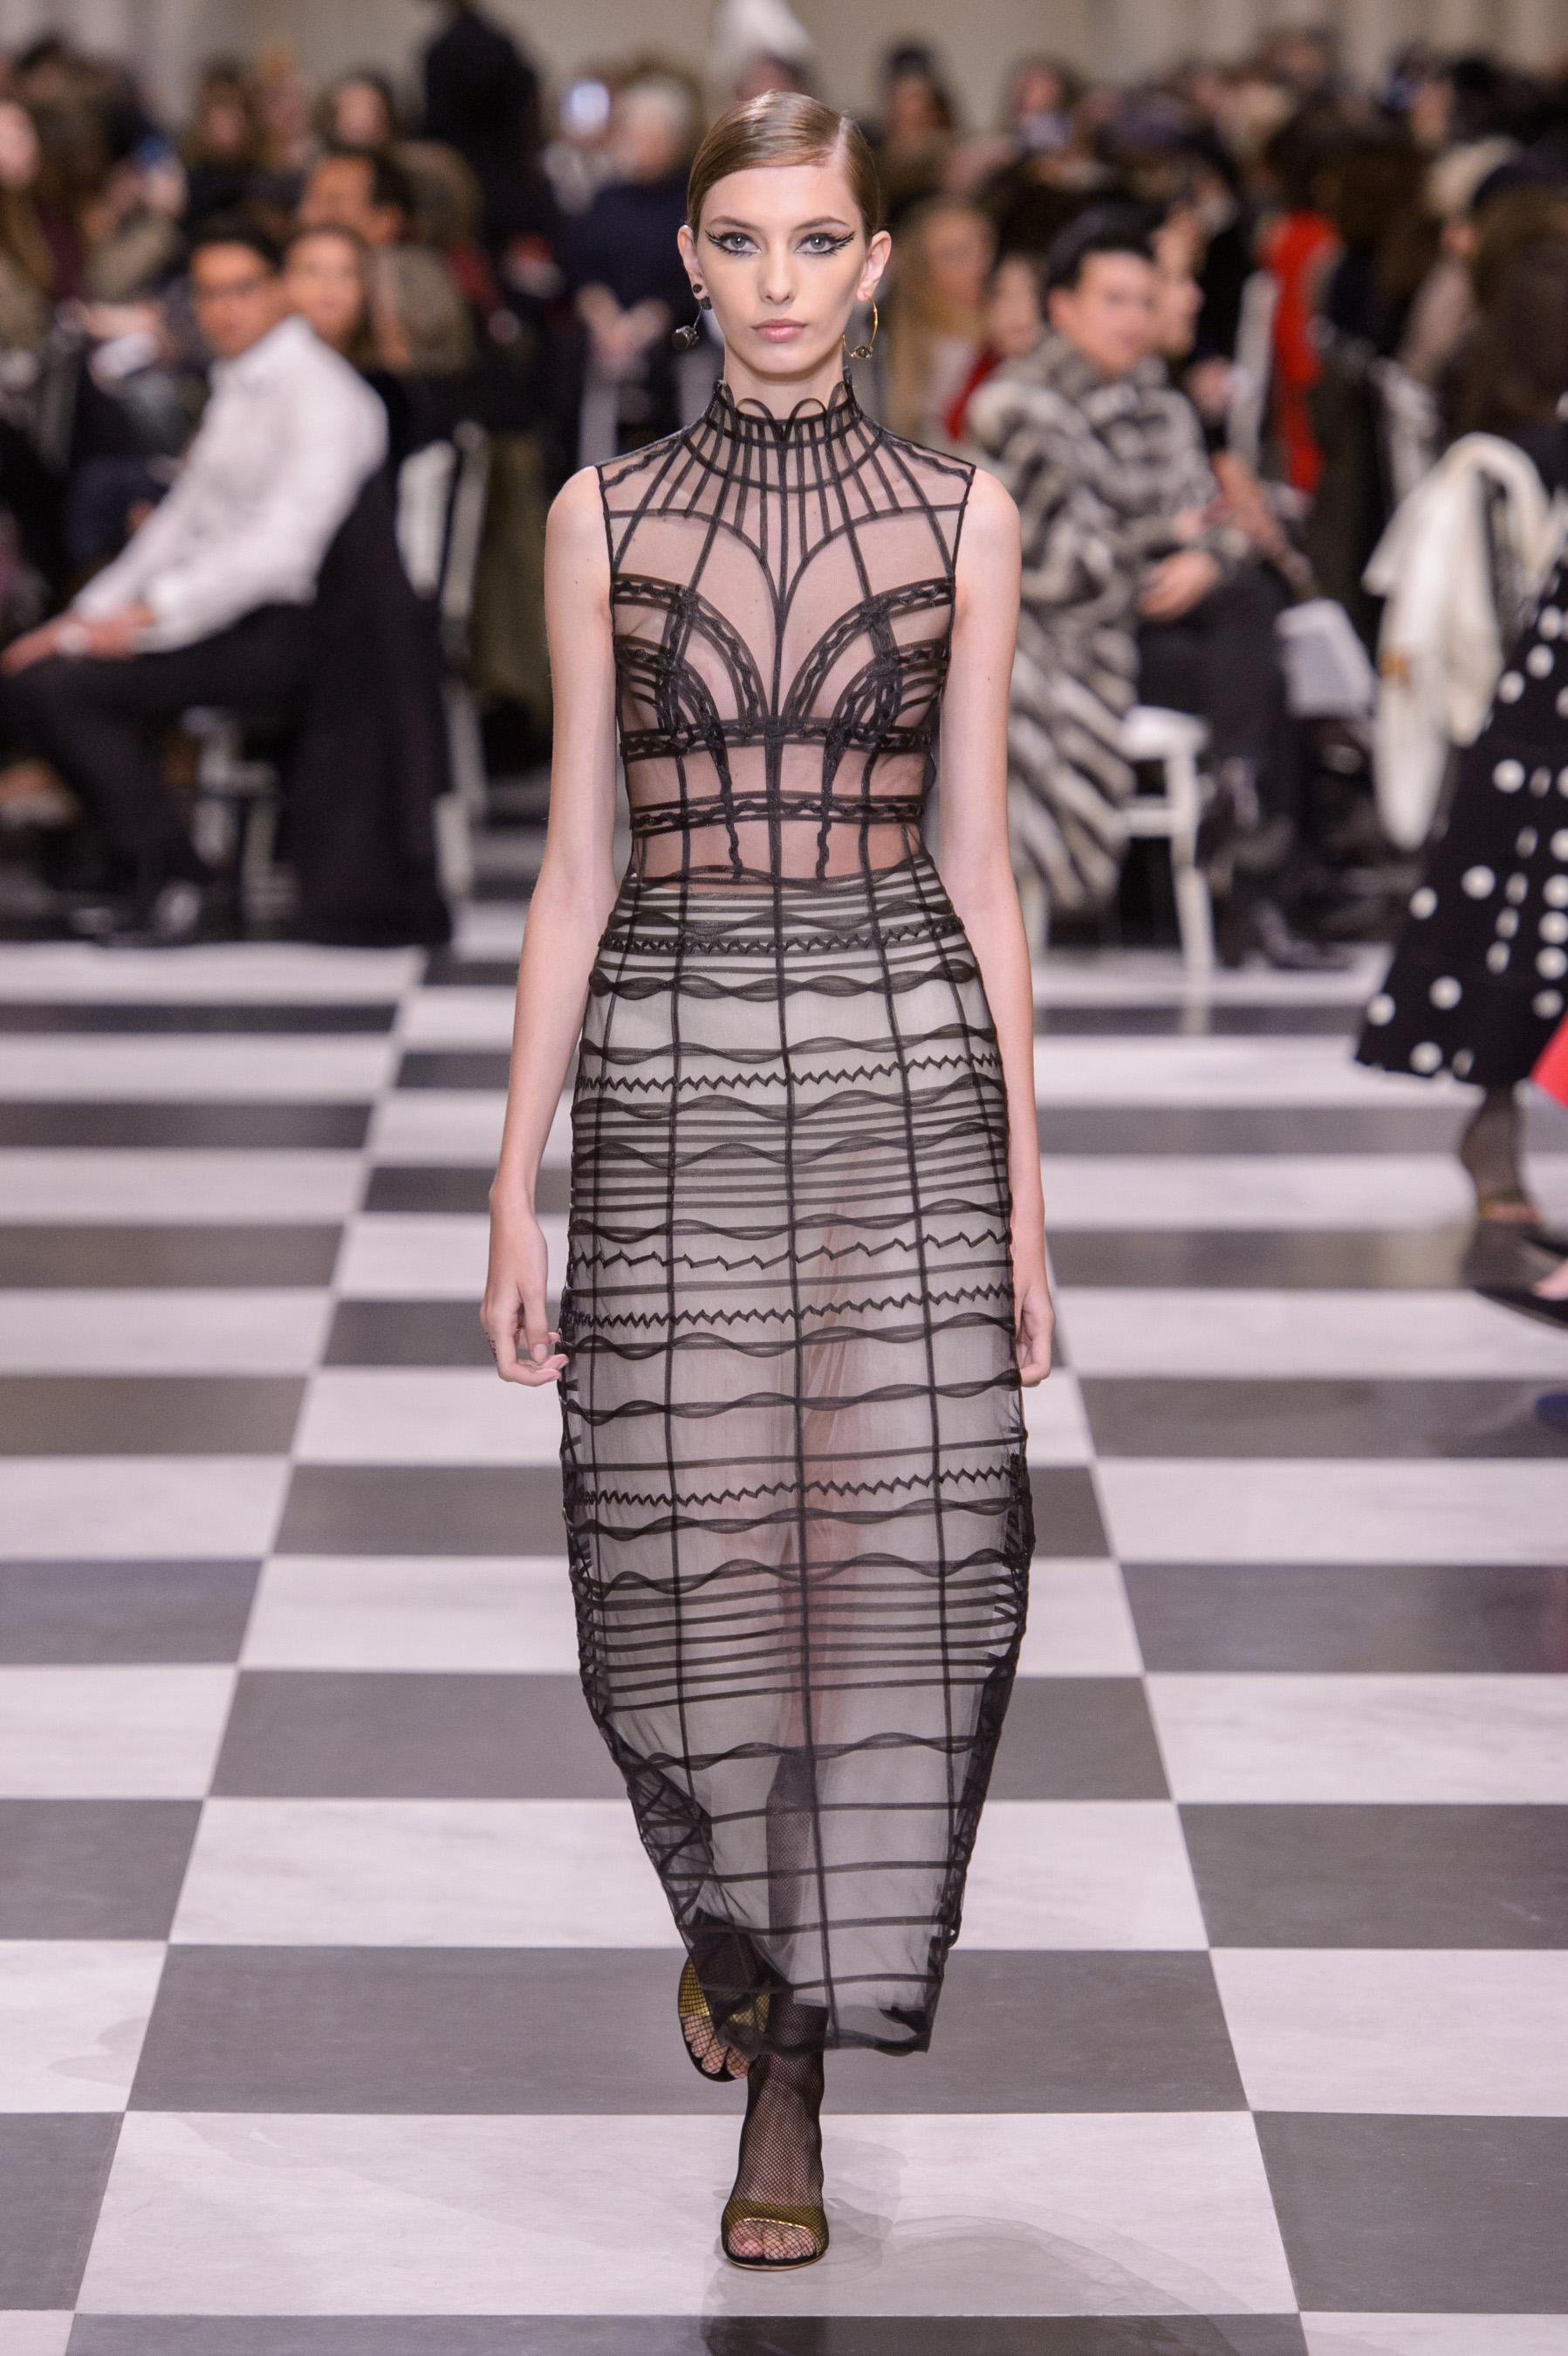 a85731f3a22 Défilé Christian Dior printemps-été 2018 Couture - Madame Figaro